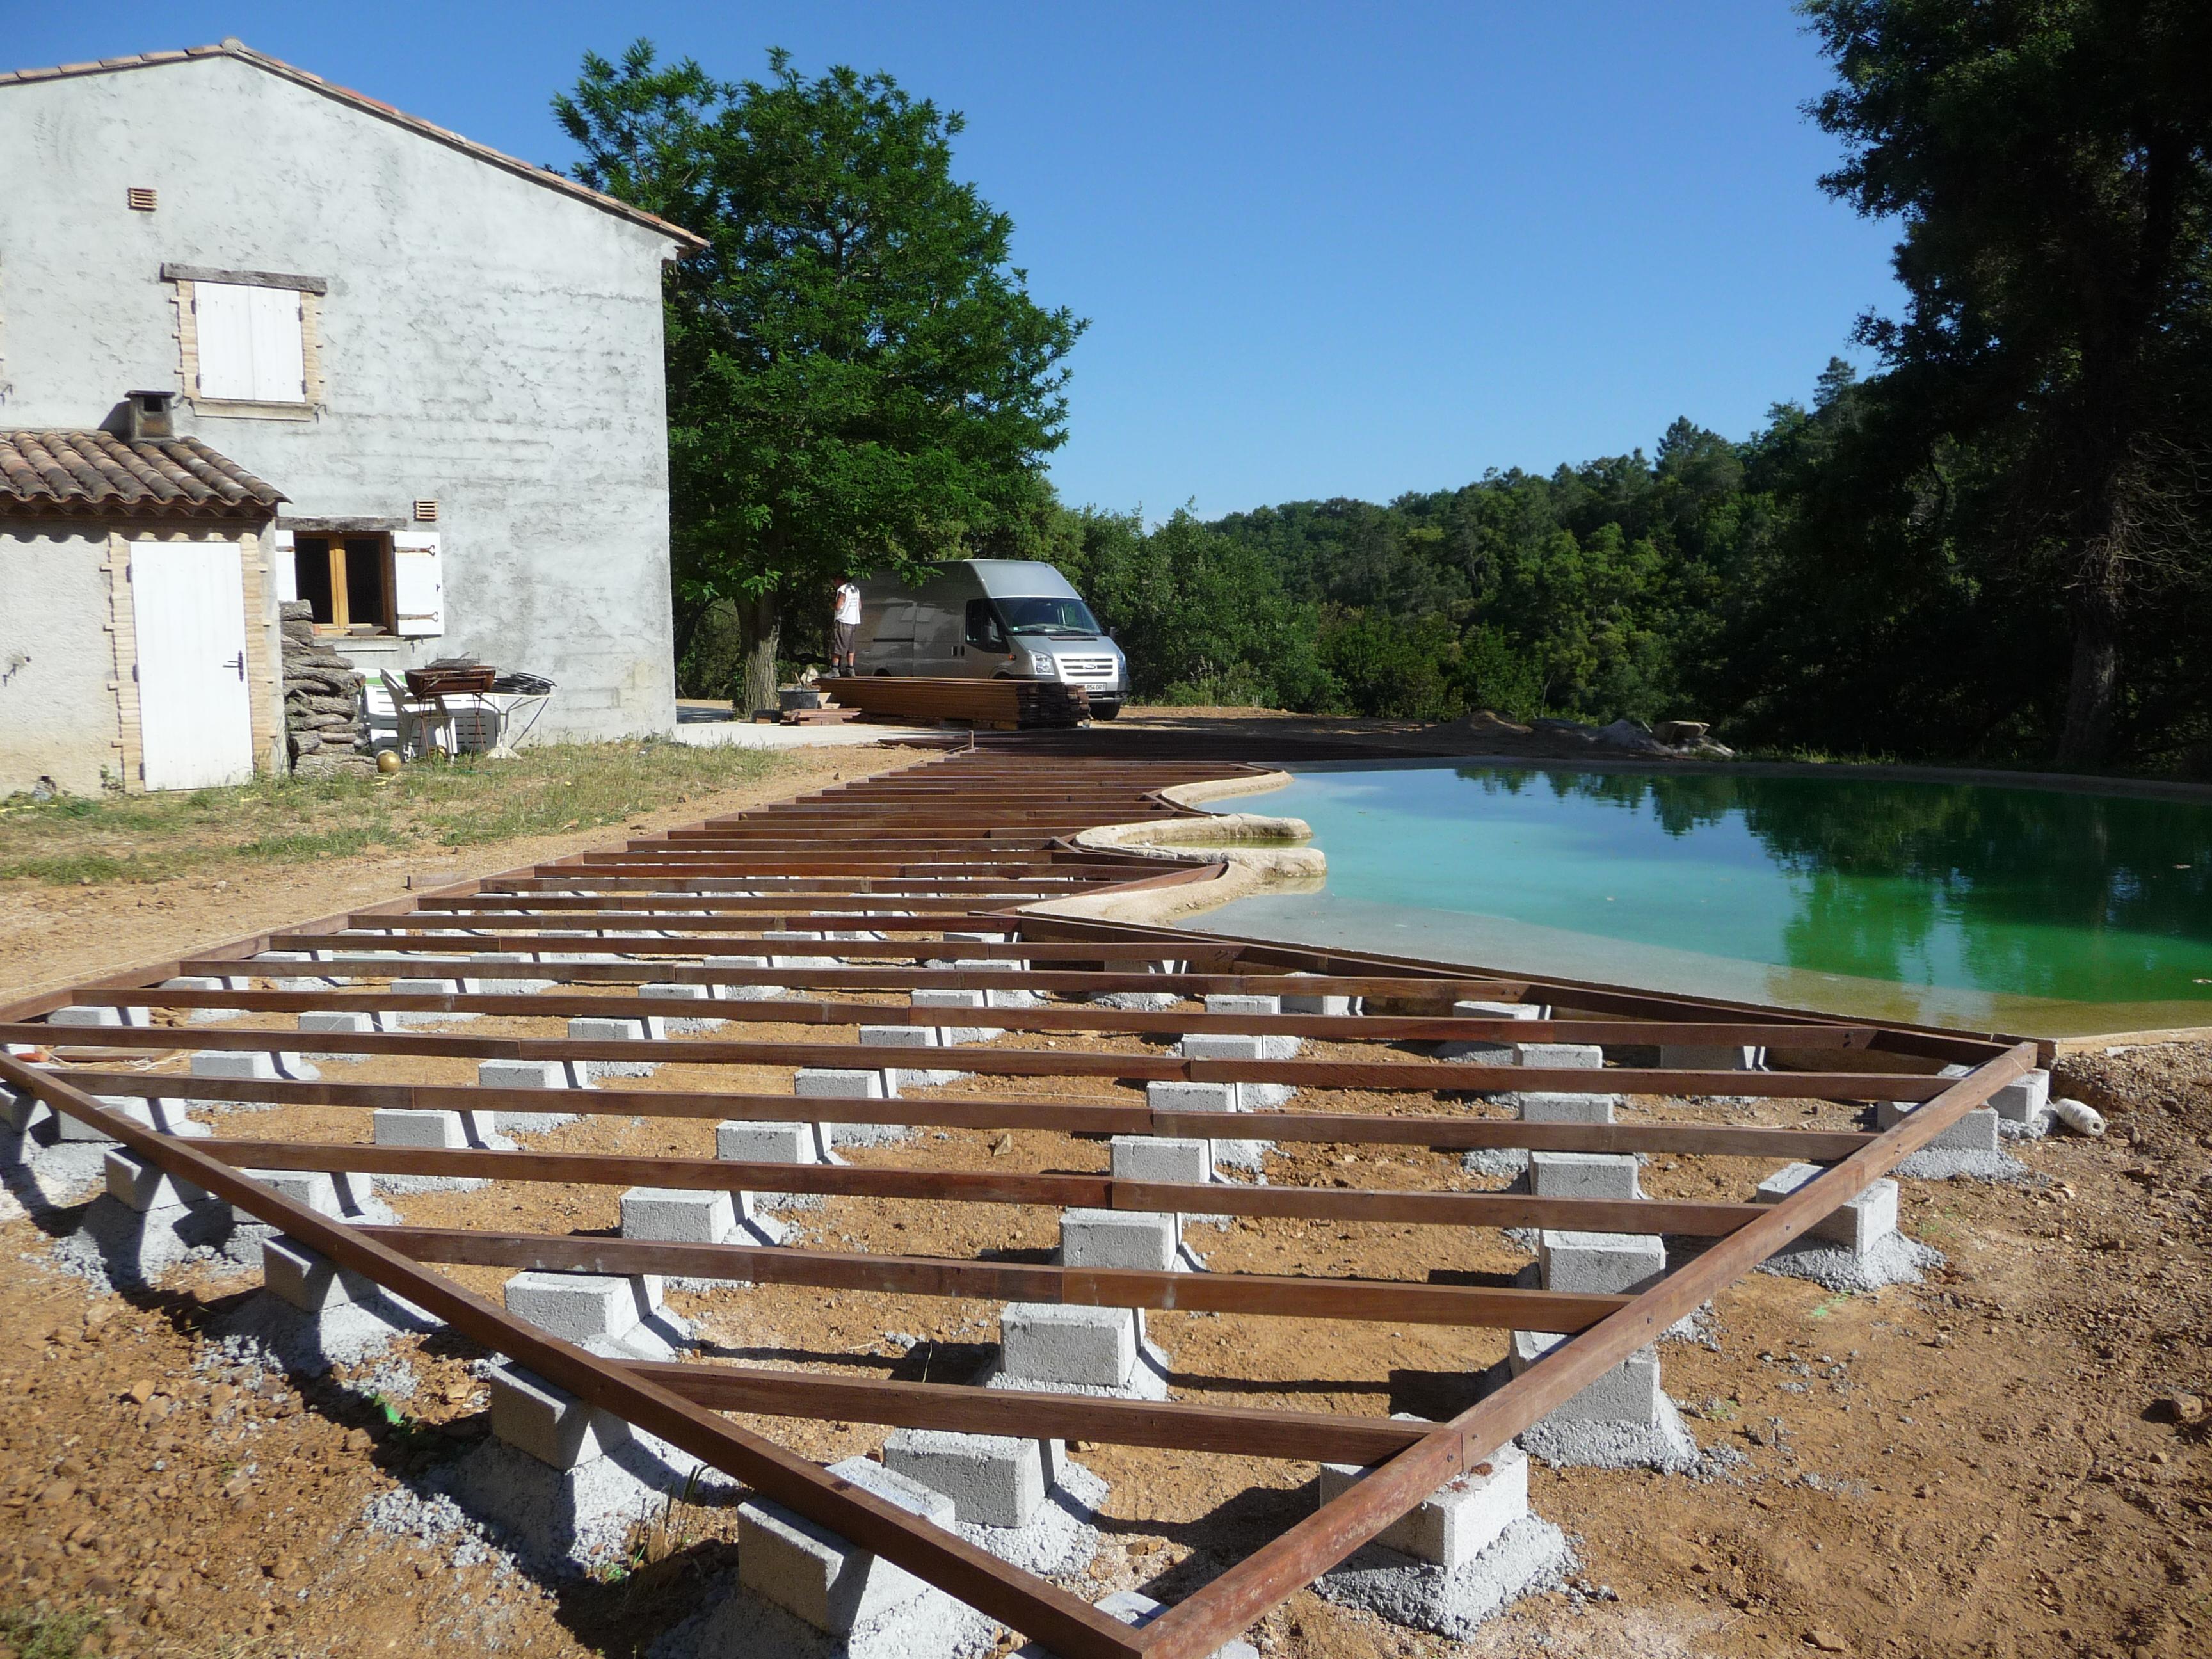 Générale-Construction » Terrasse De Piscine En Ipe destiné Terrasse Ipe Piscine